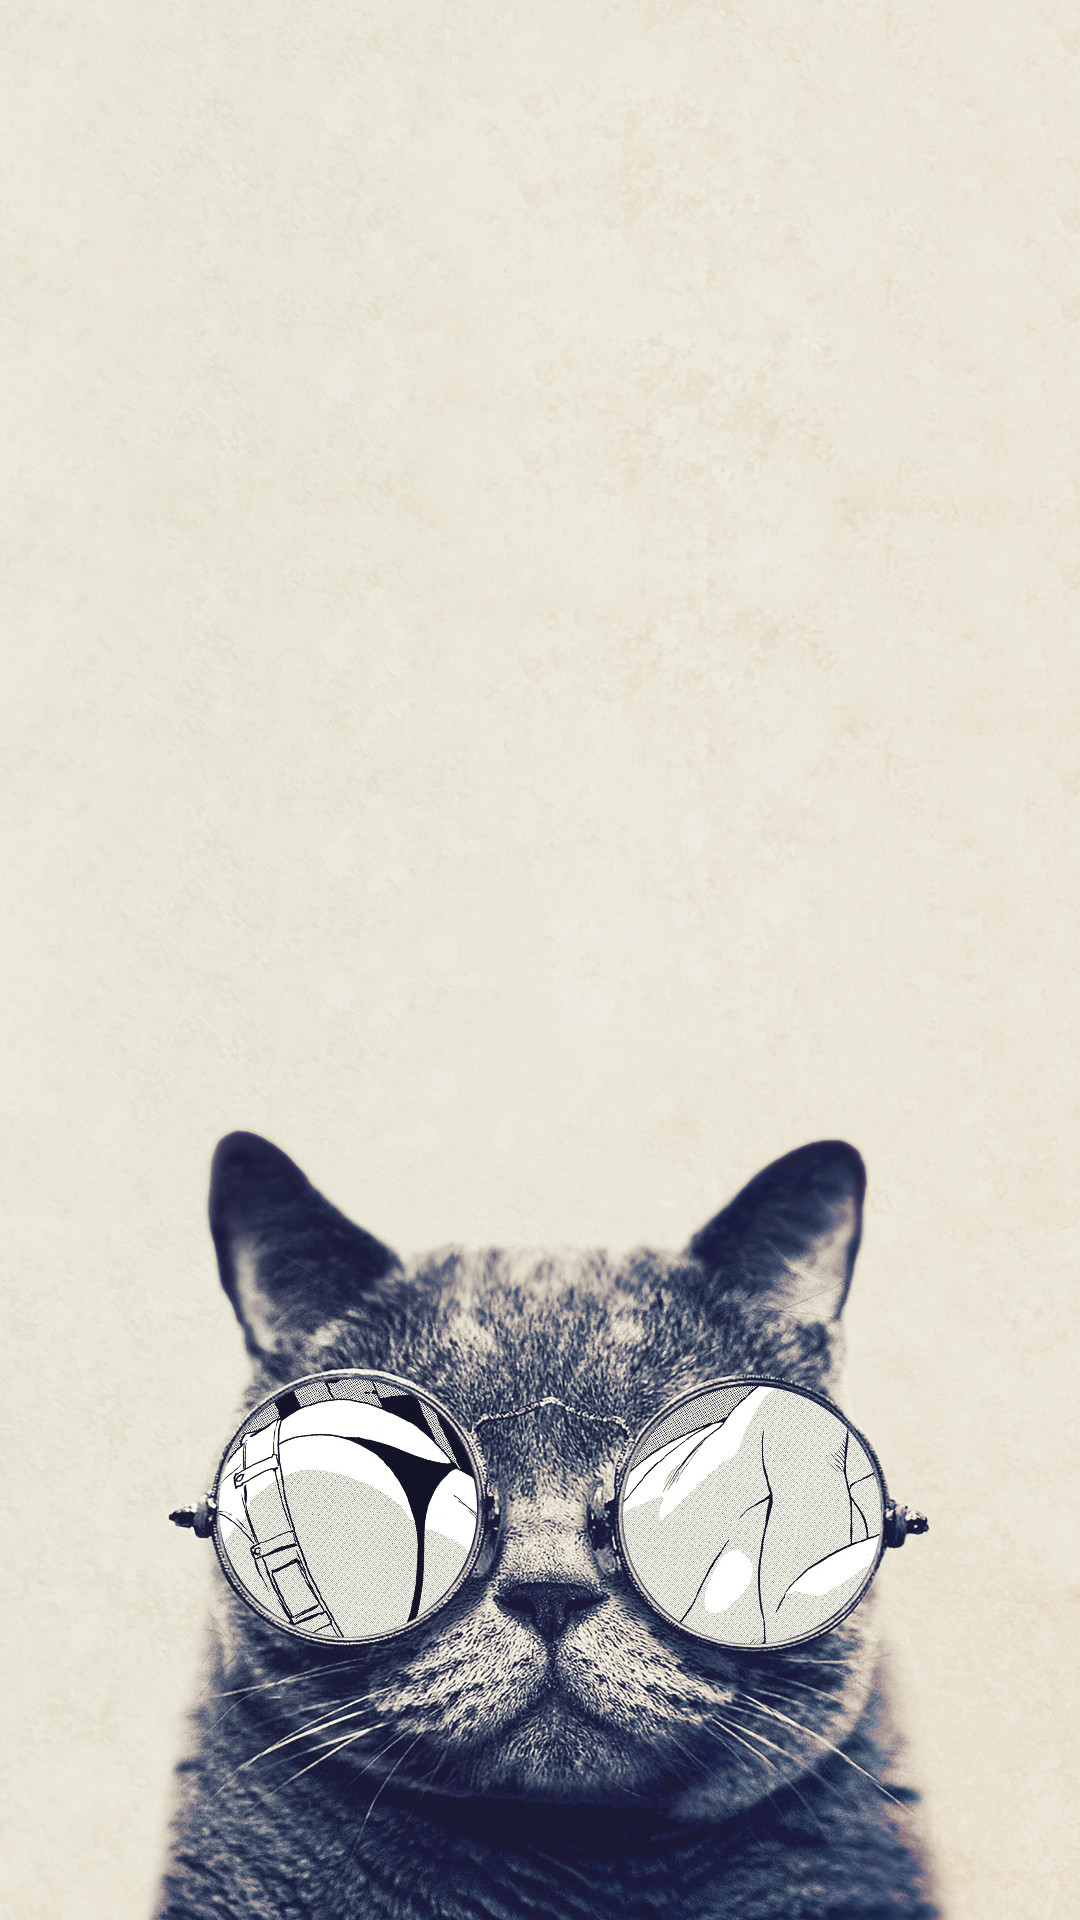 Cool Cat Glasses iPhone 6 Plus HD Wallpaper …